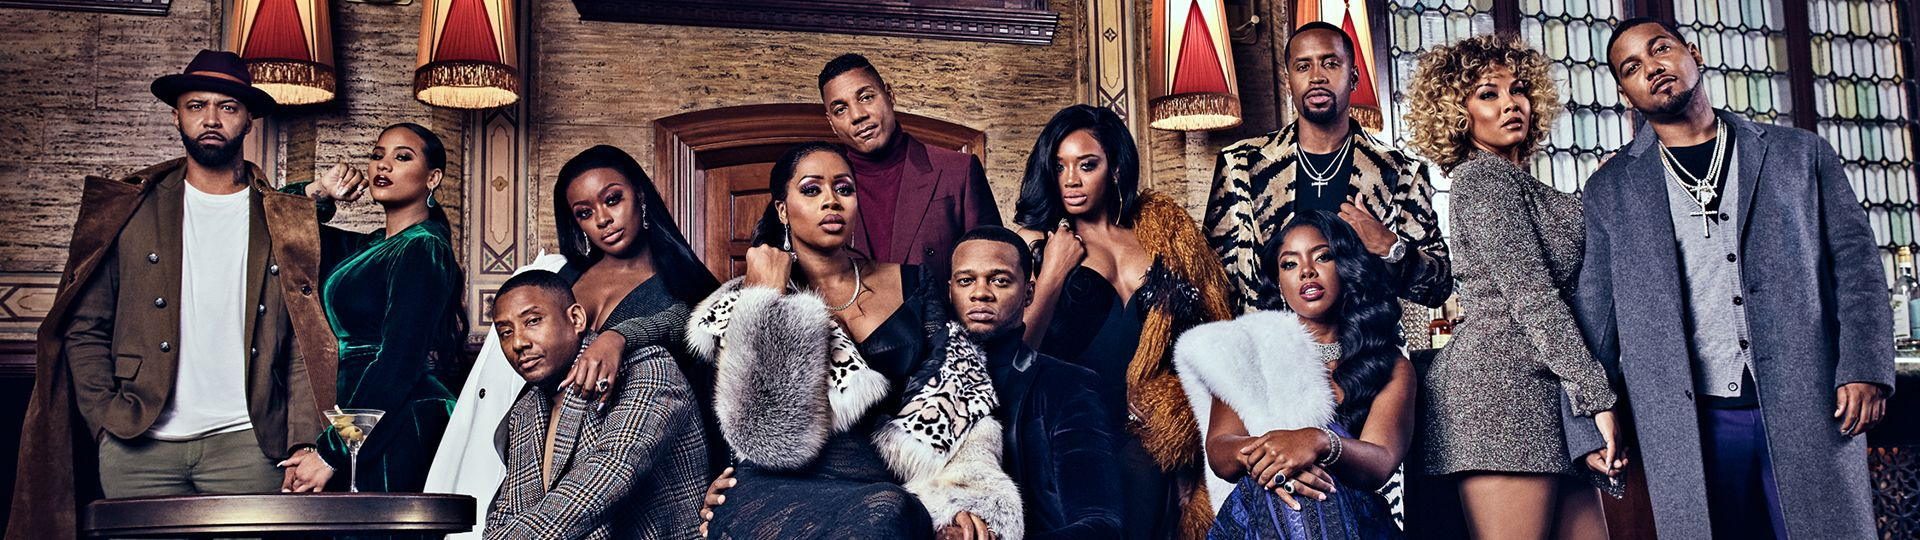 Love and hip hop cast new york